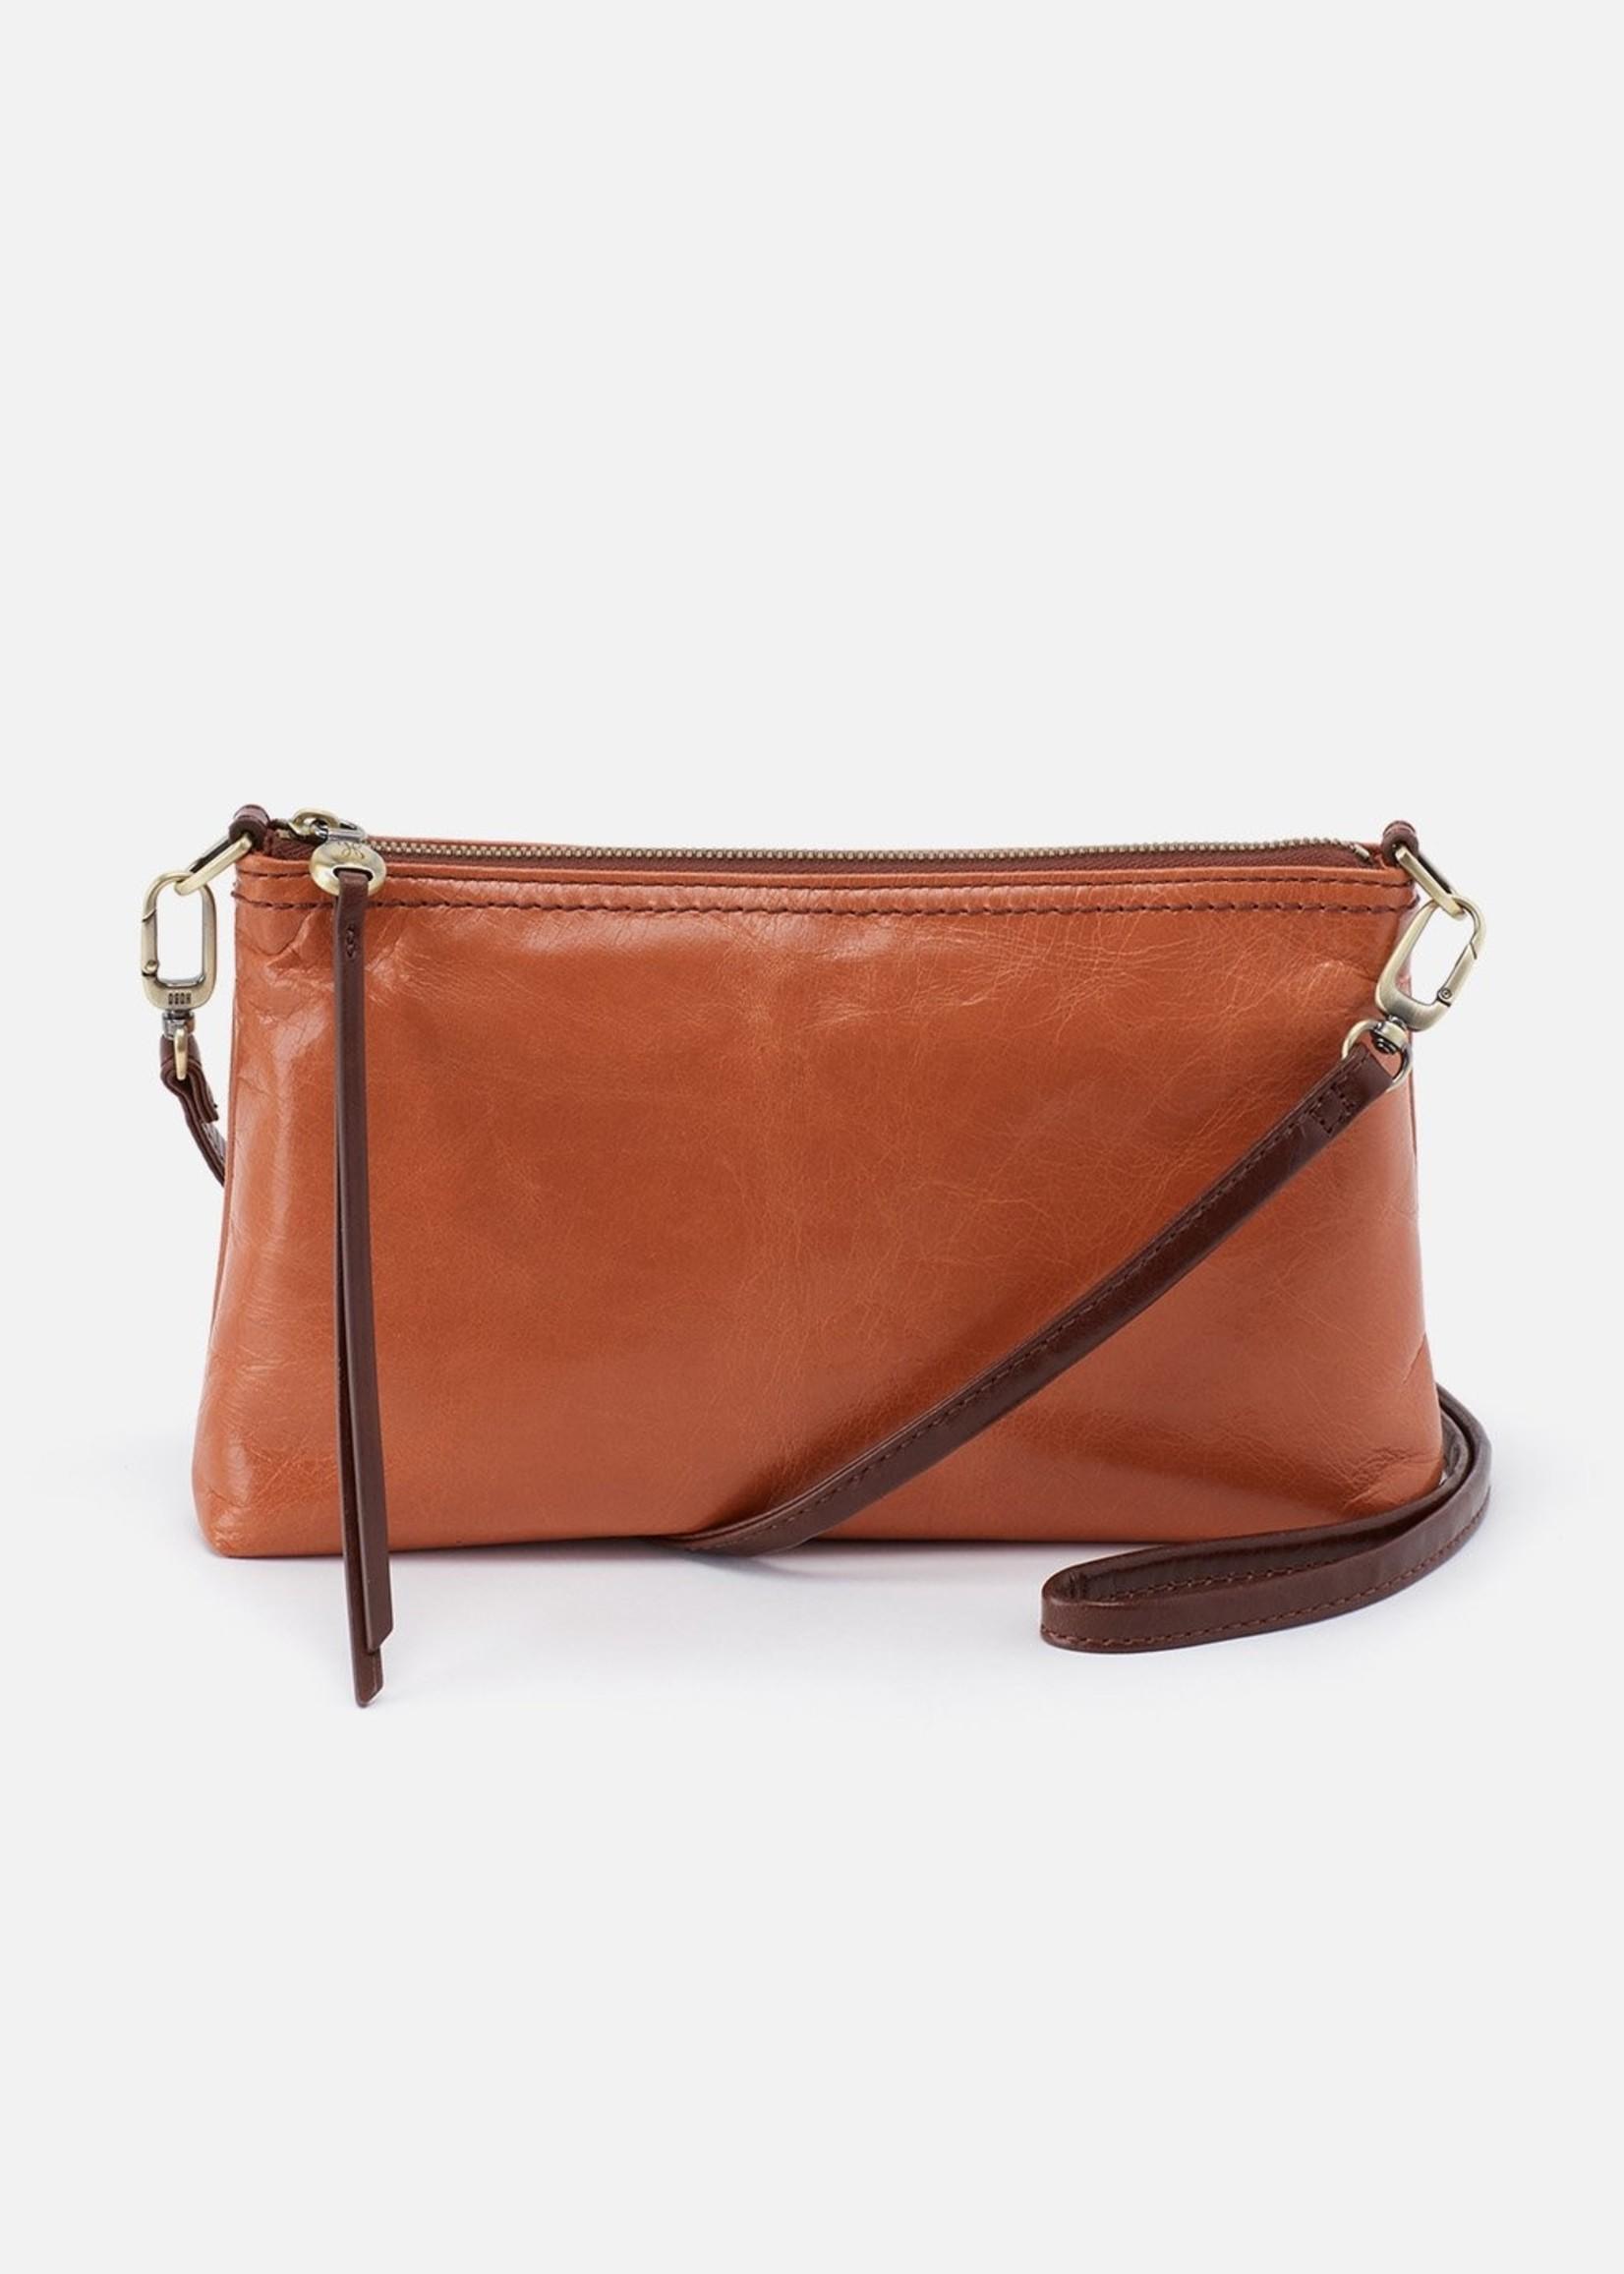 HOBO Bags Darcy Crossbody Amber